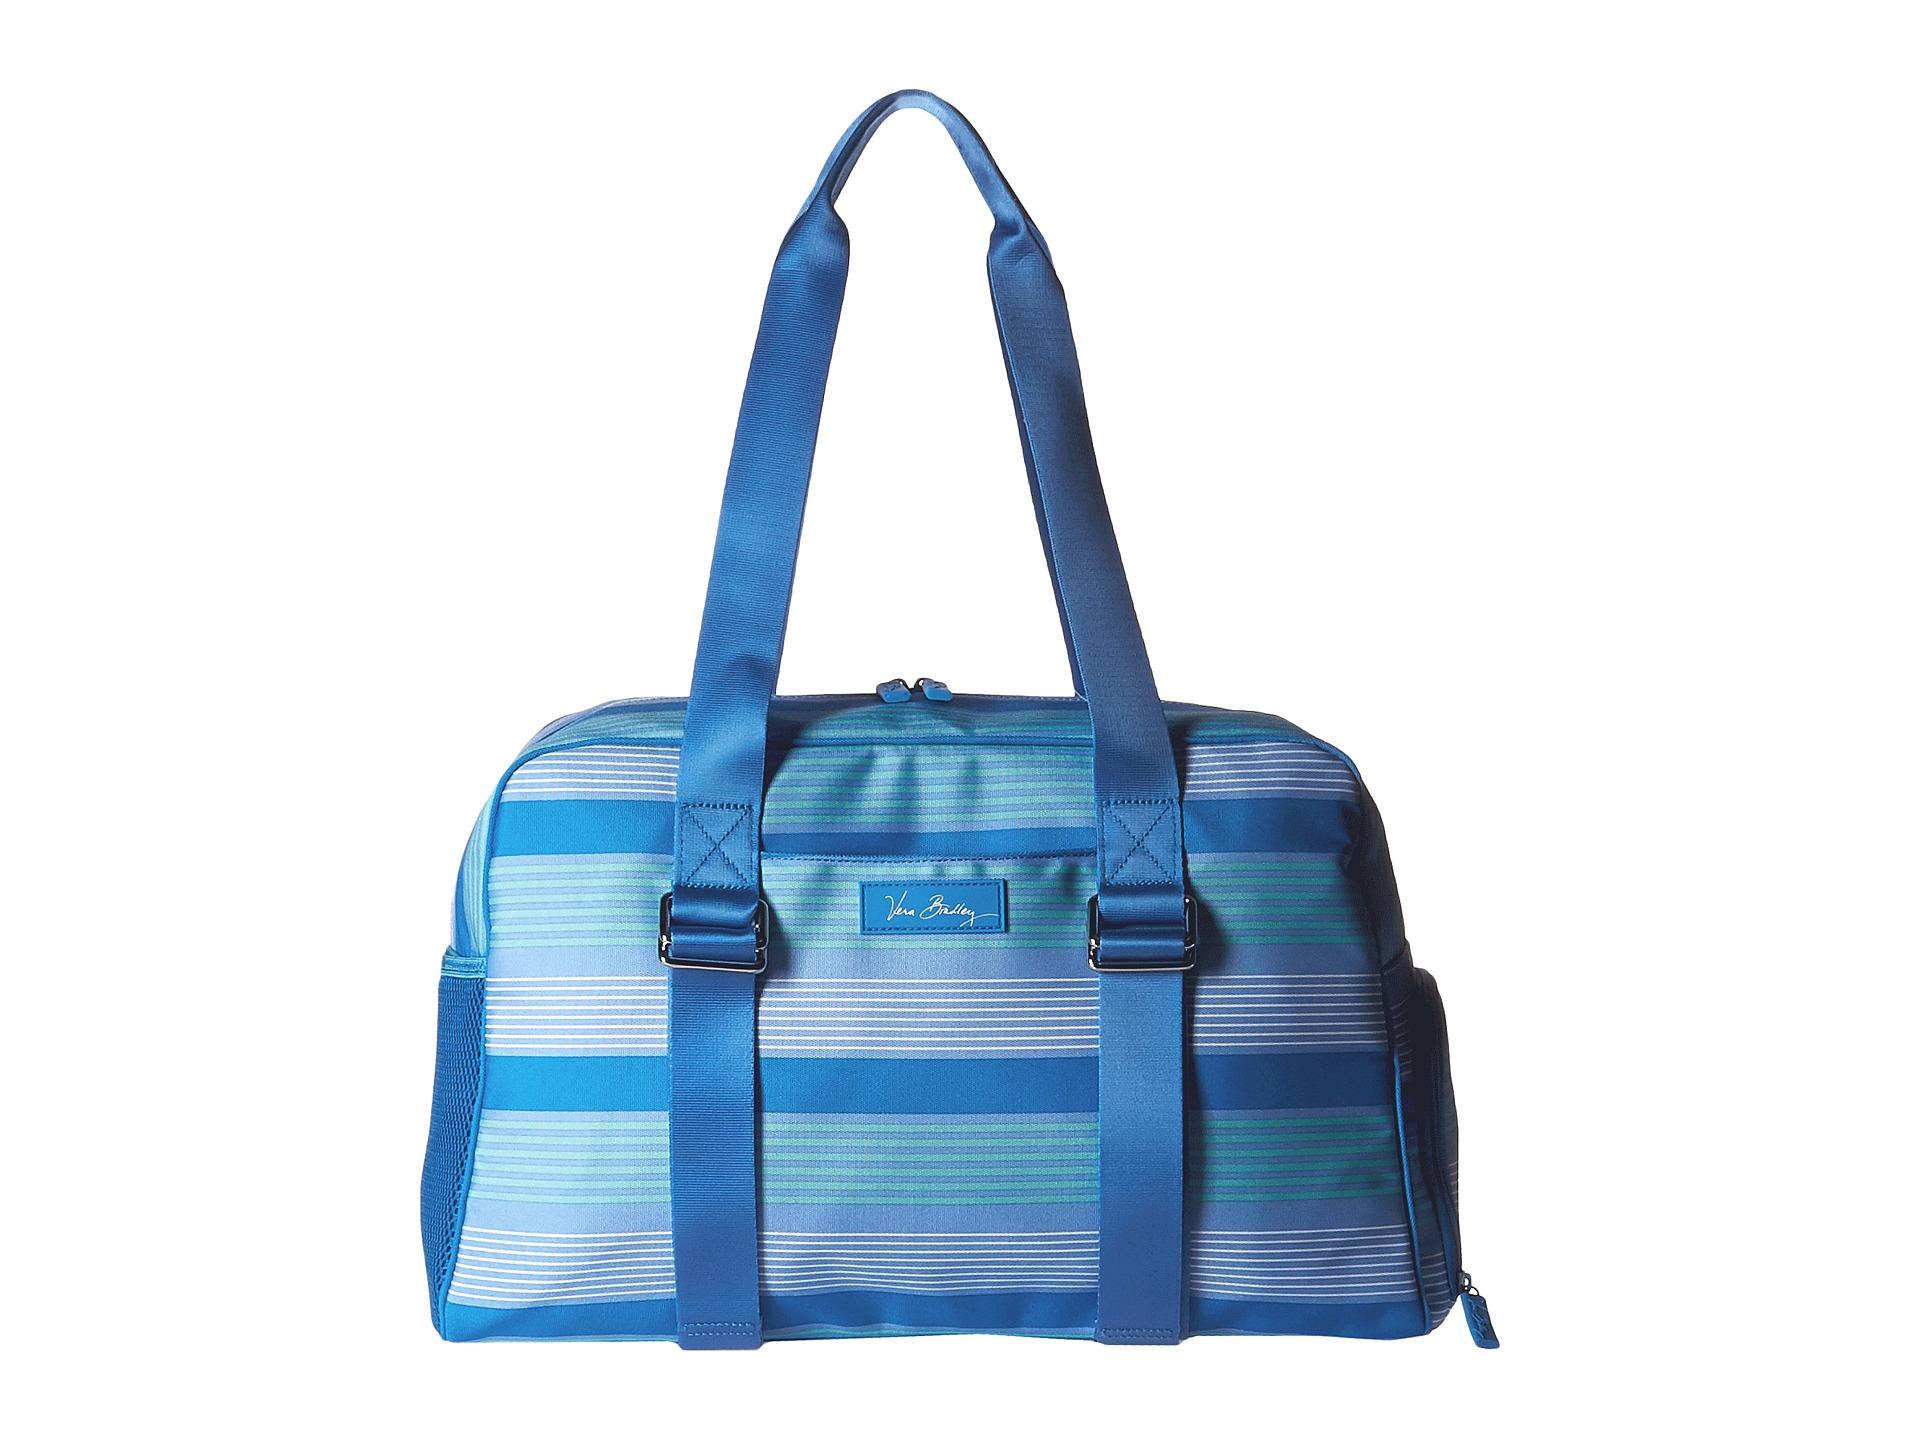 Lyst - Vera Bradley Lighten Up Yoga Sport Bag in Blue